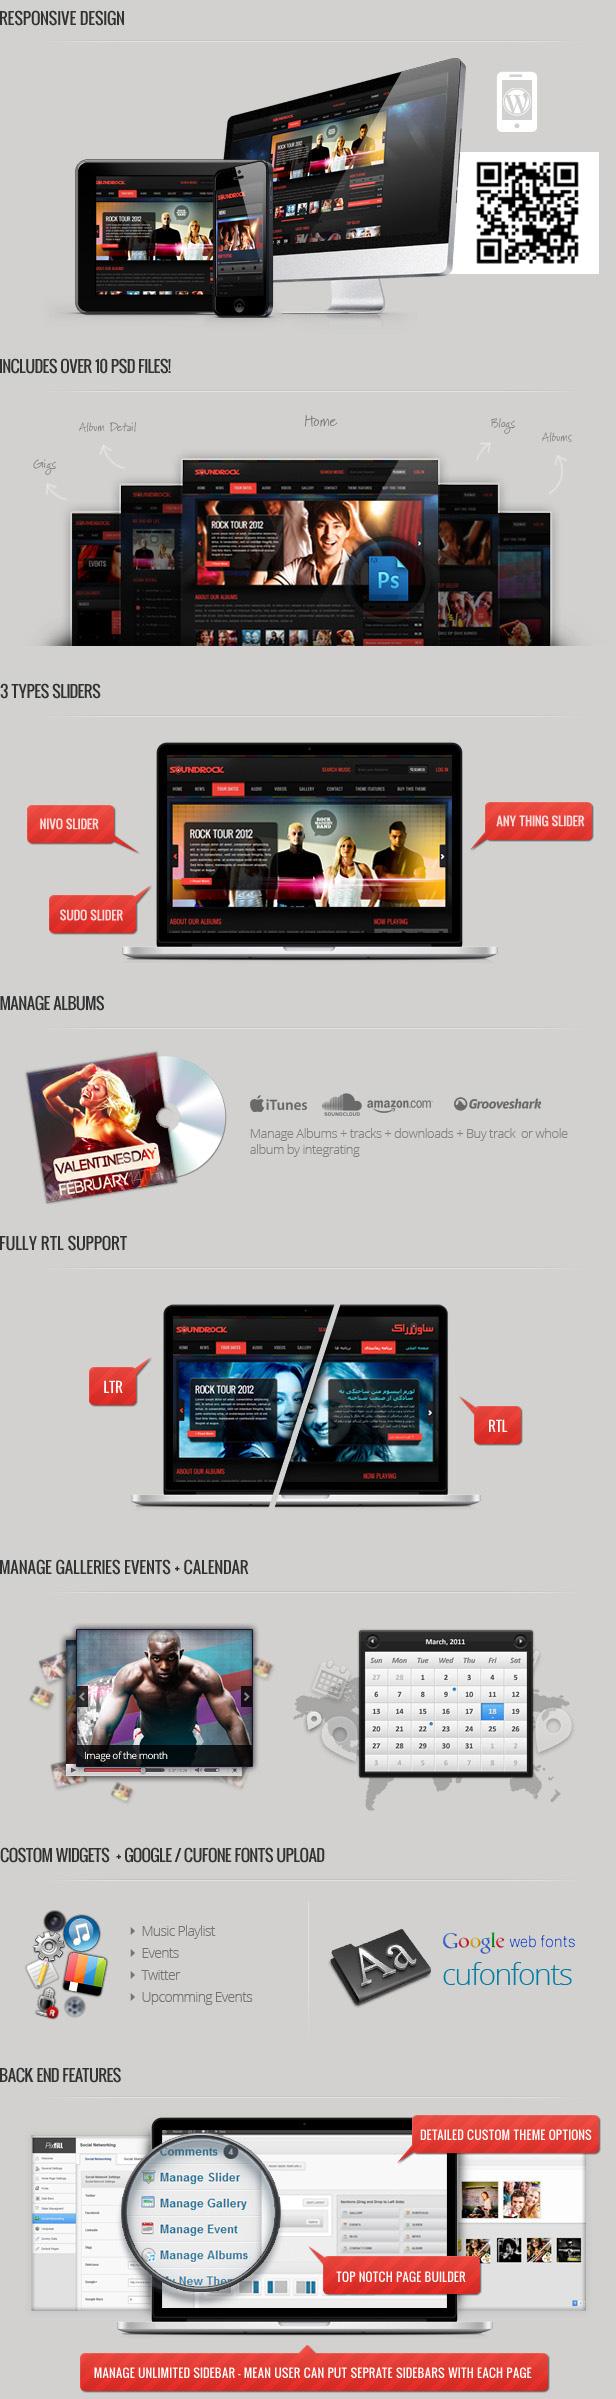 sound2 - Sound Rock - Music Band Wordpress Theme